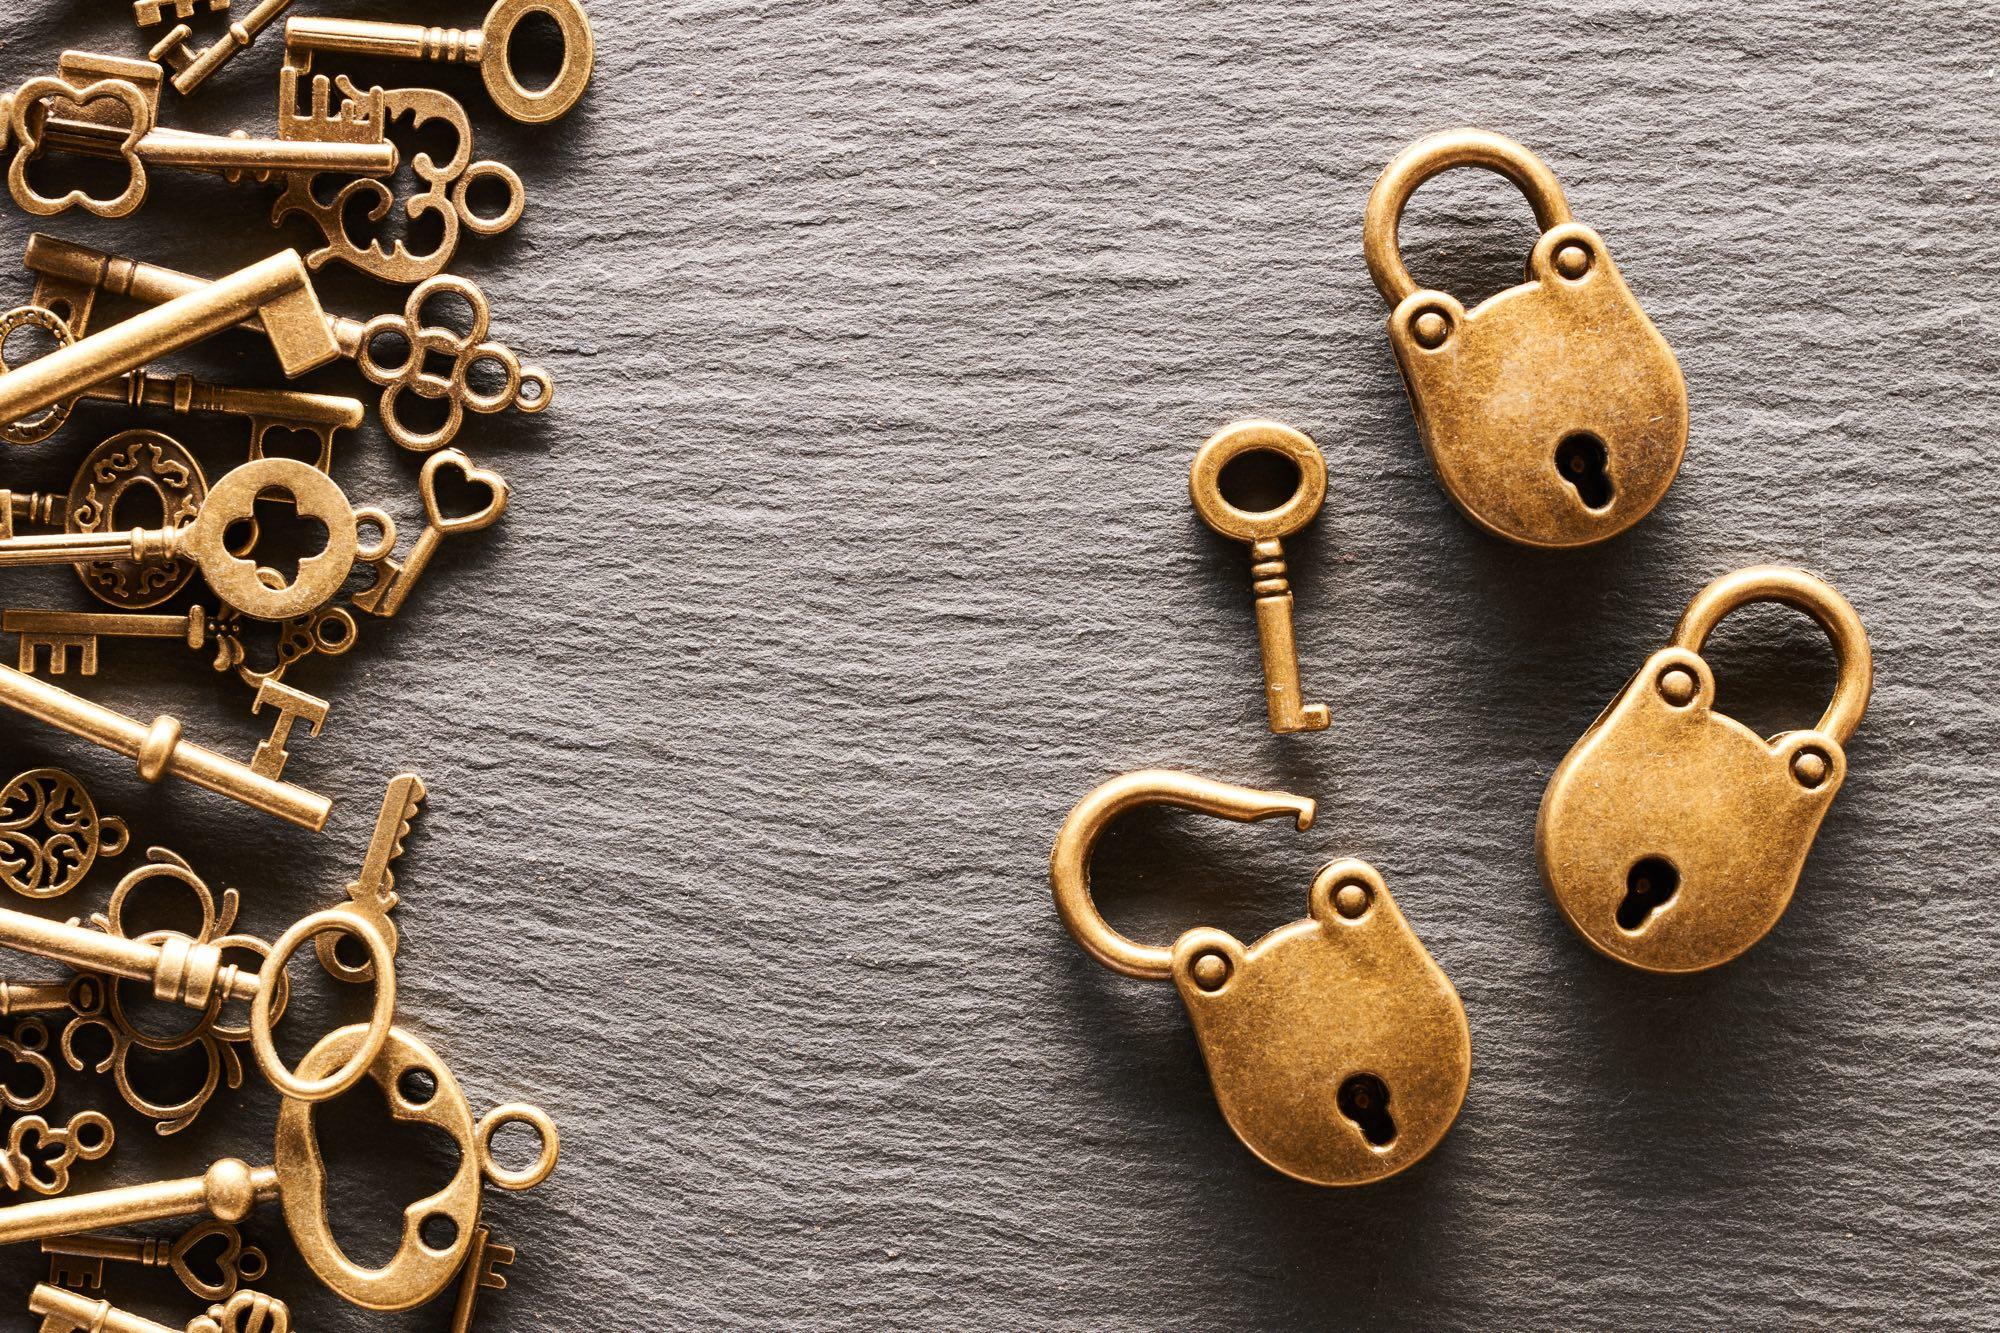 various-metal-keys-escape-rooms